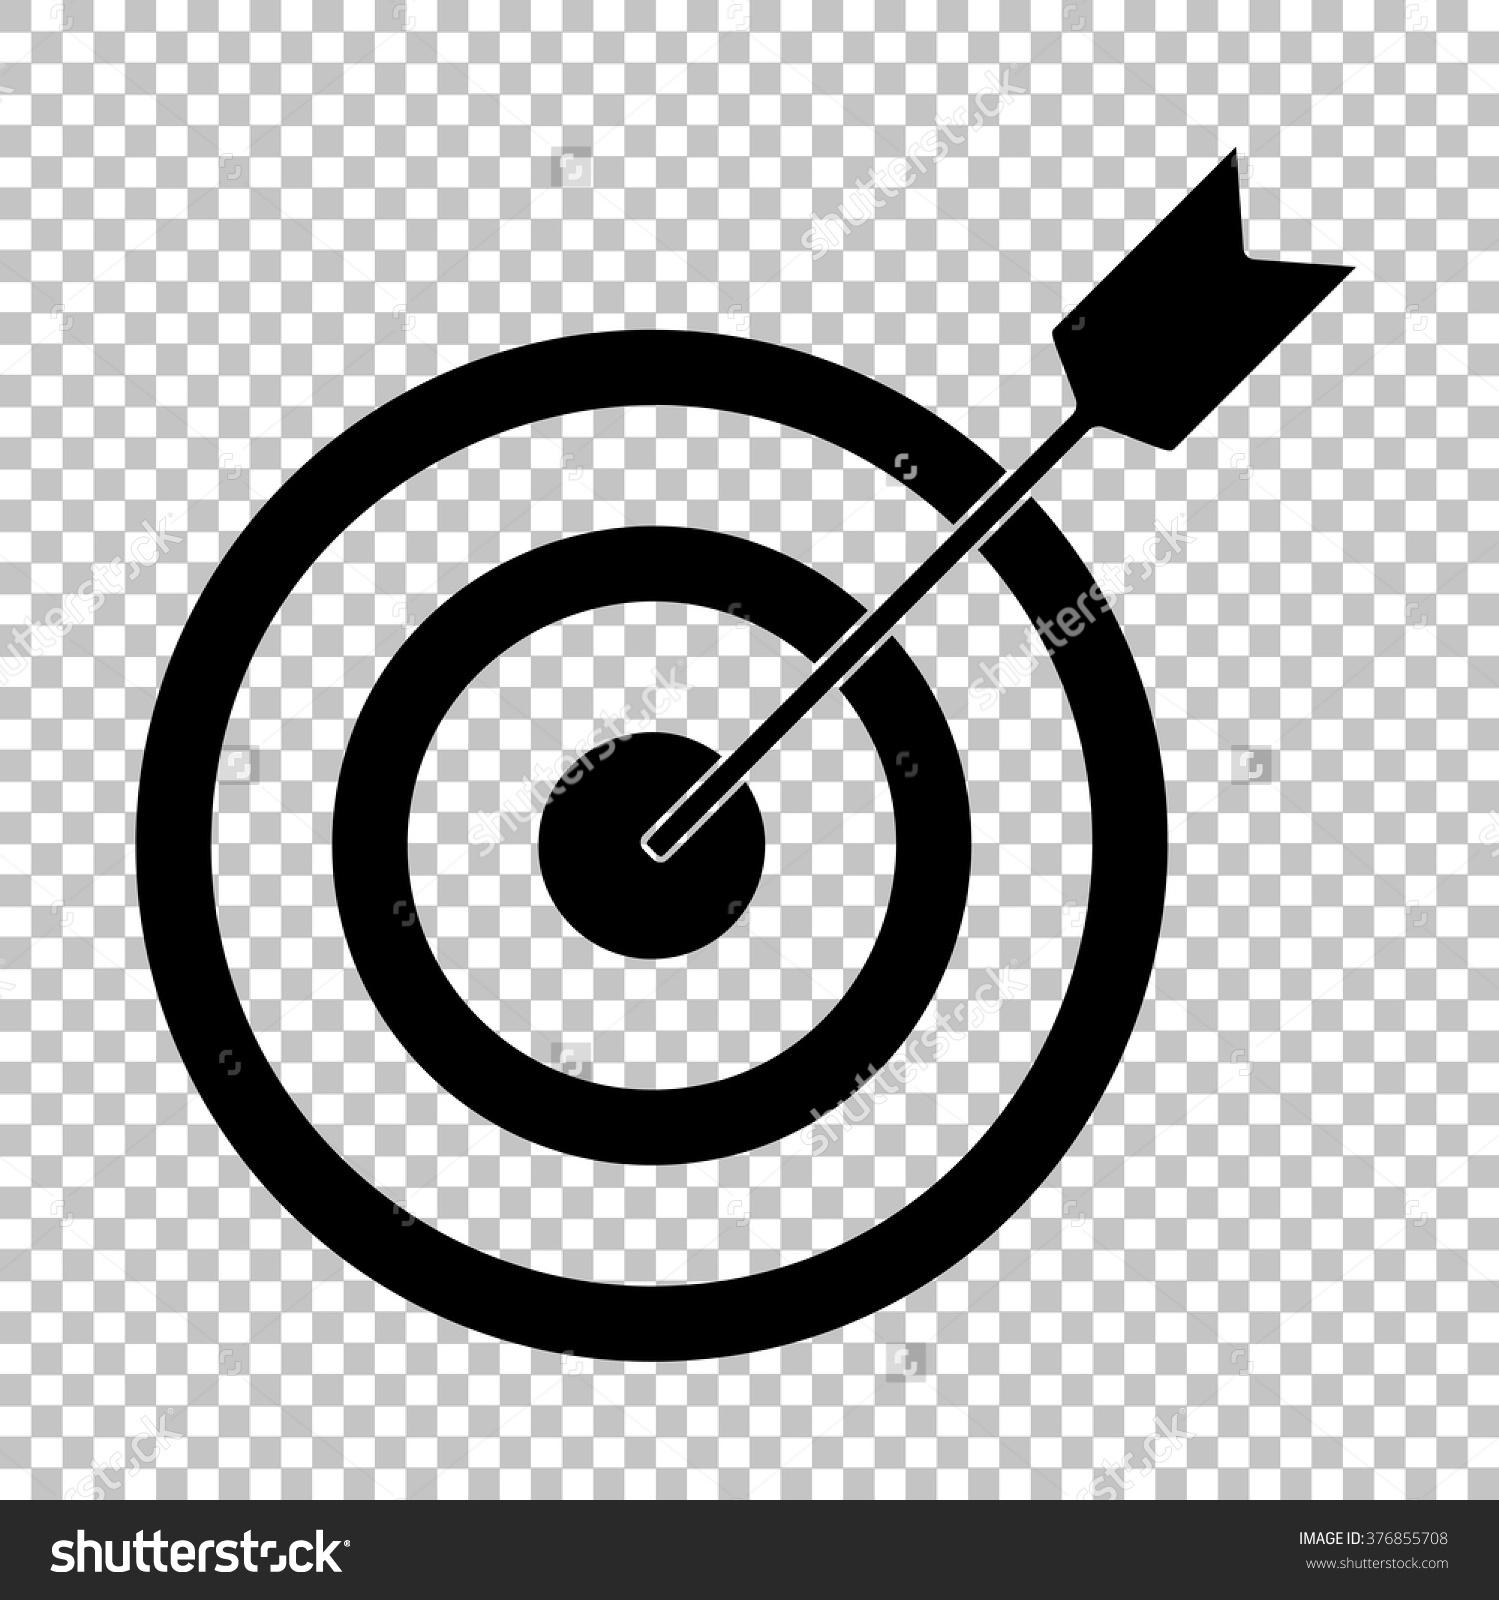 Target clipart no background clipart transparent Target clipart no background - ClipartFest clipart transparent